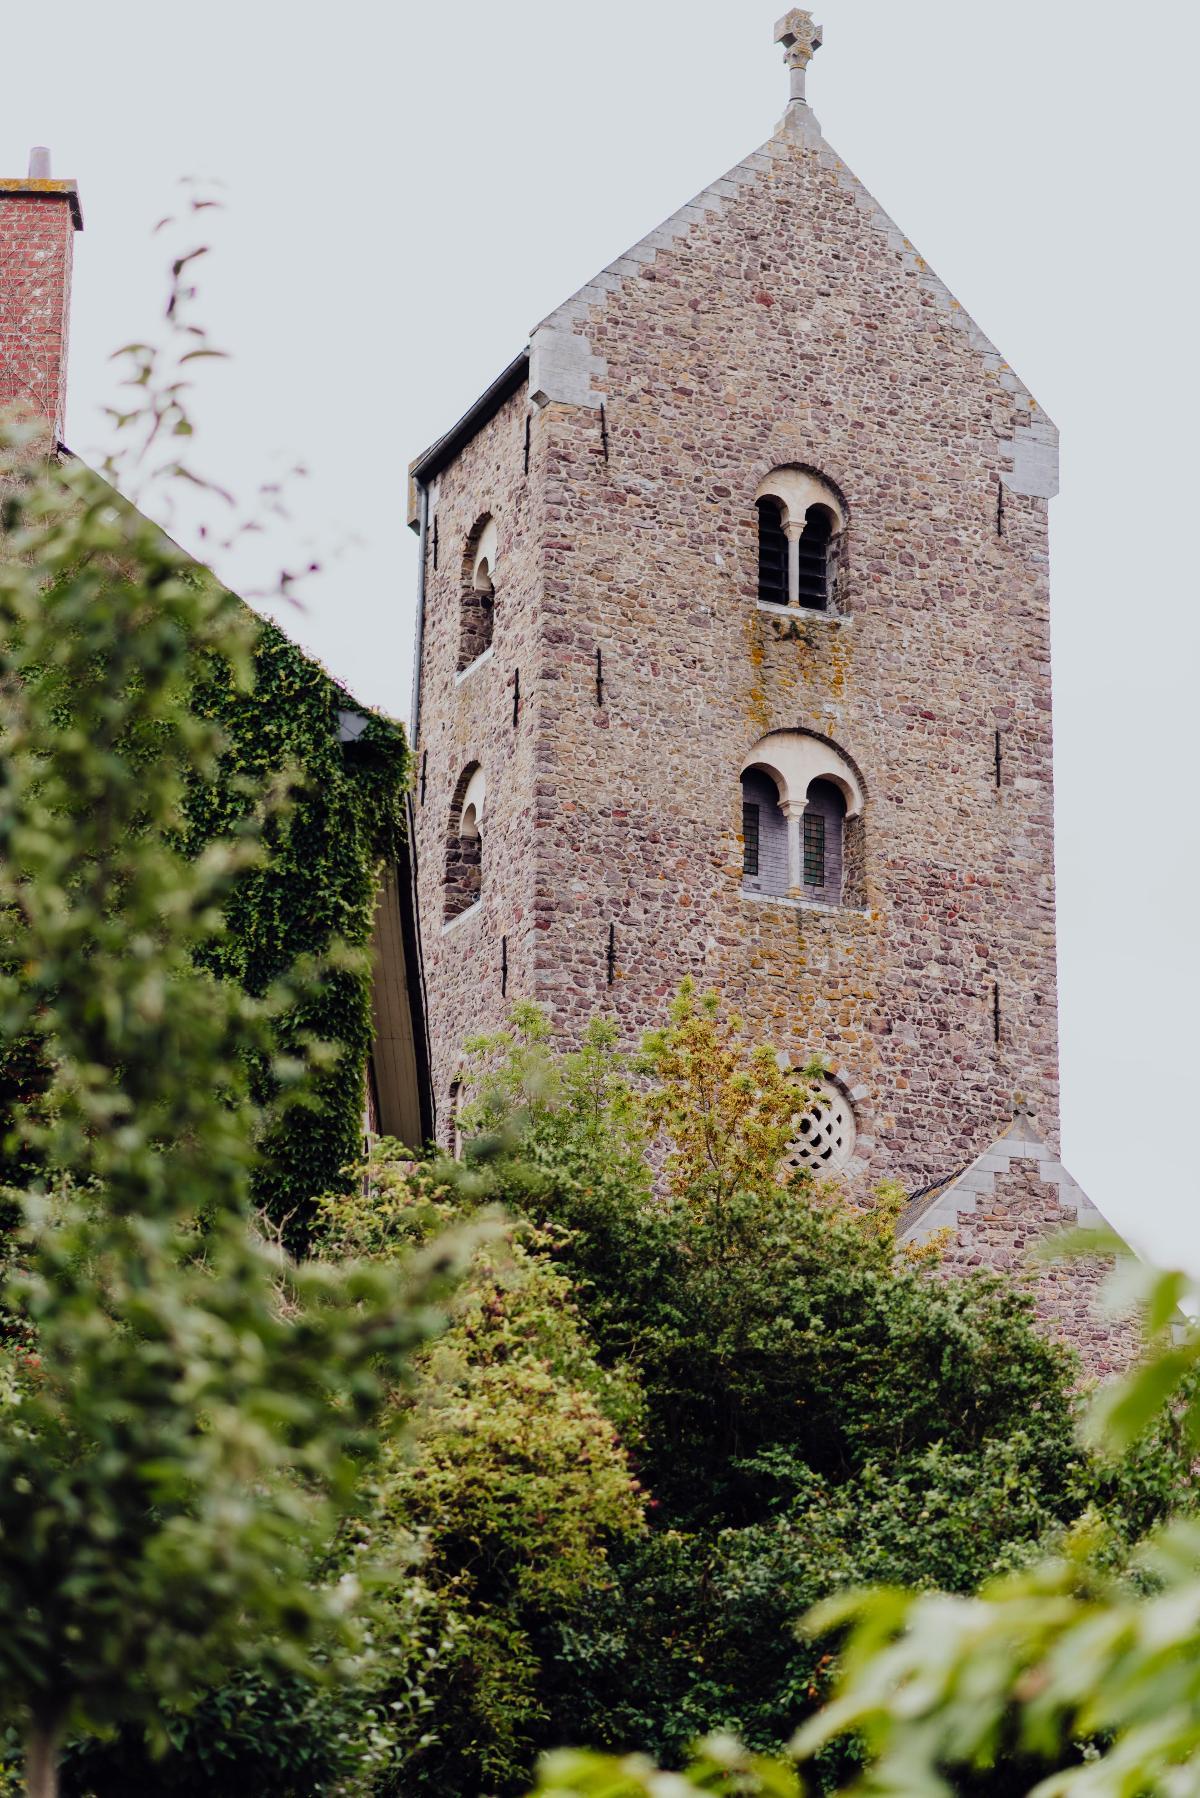 Collégiale Saint-Ursmer et jardin de Folcuin